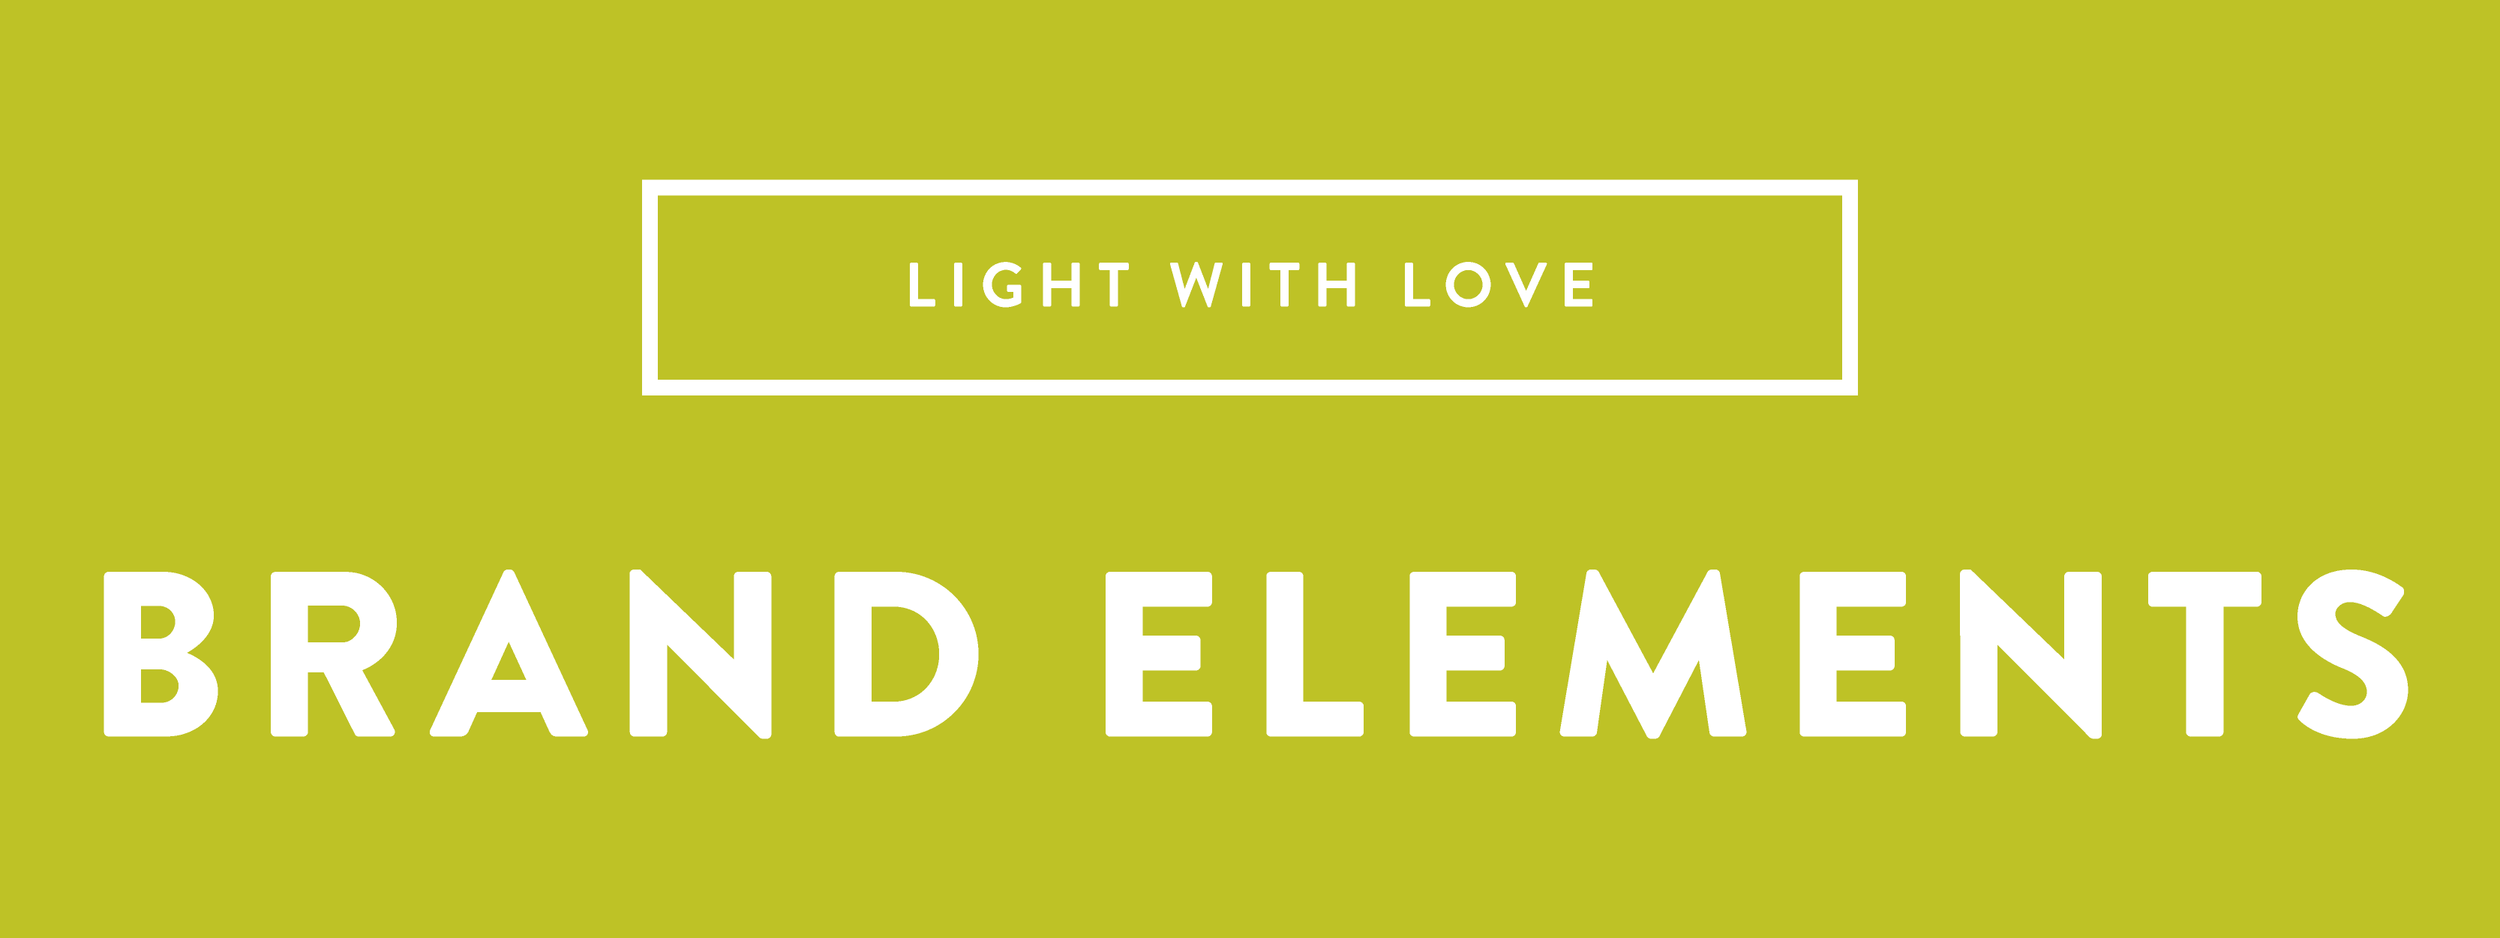 LWLP_Brand Elements Header.png